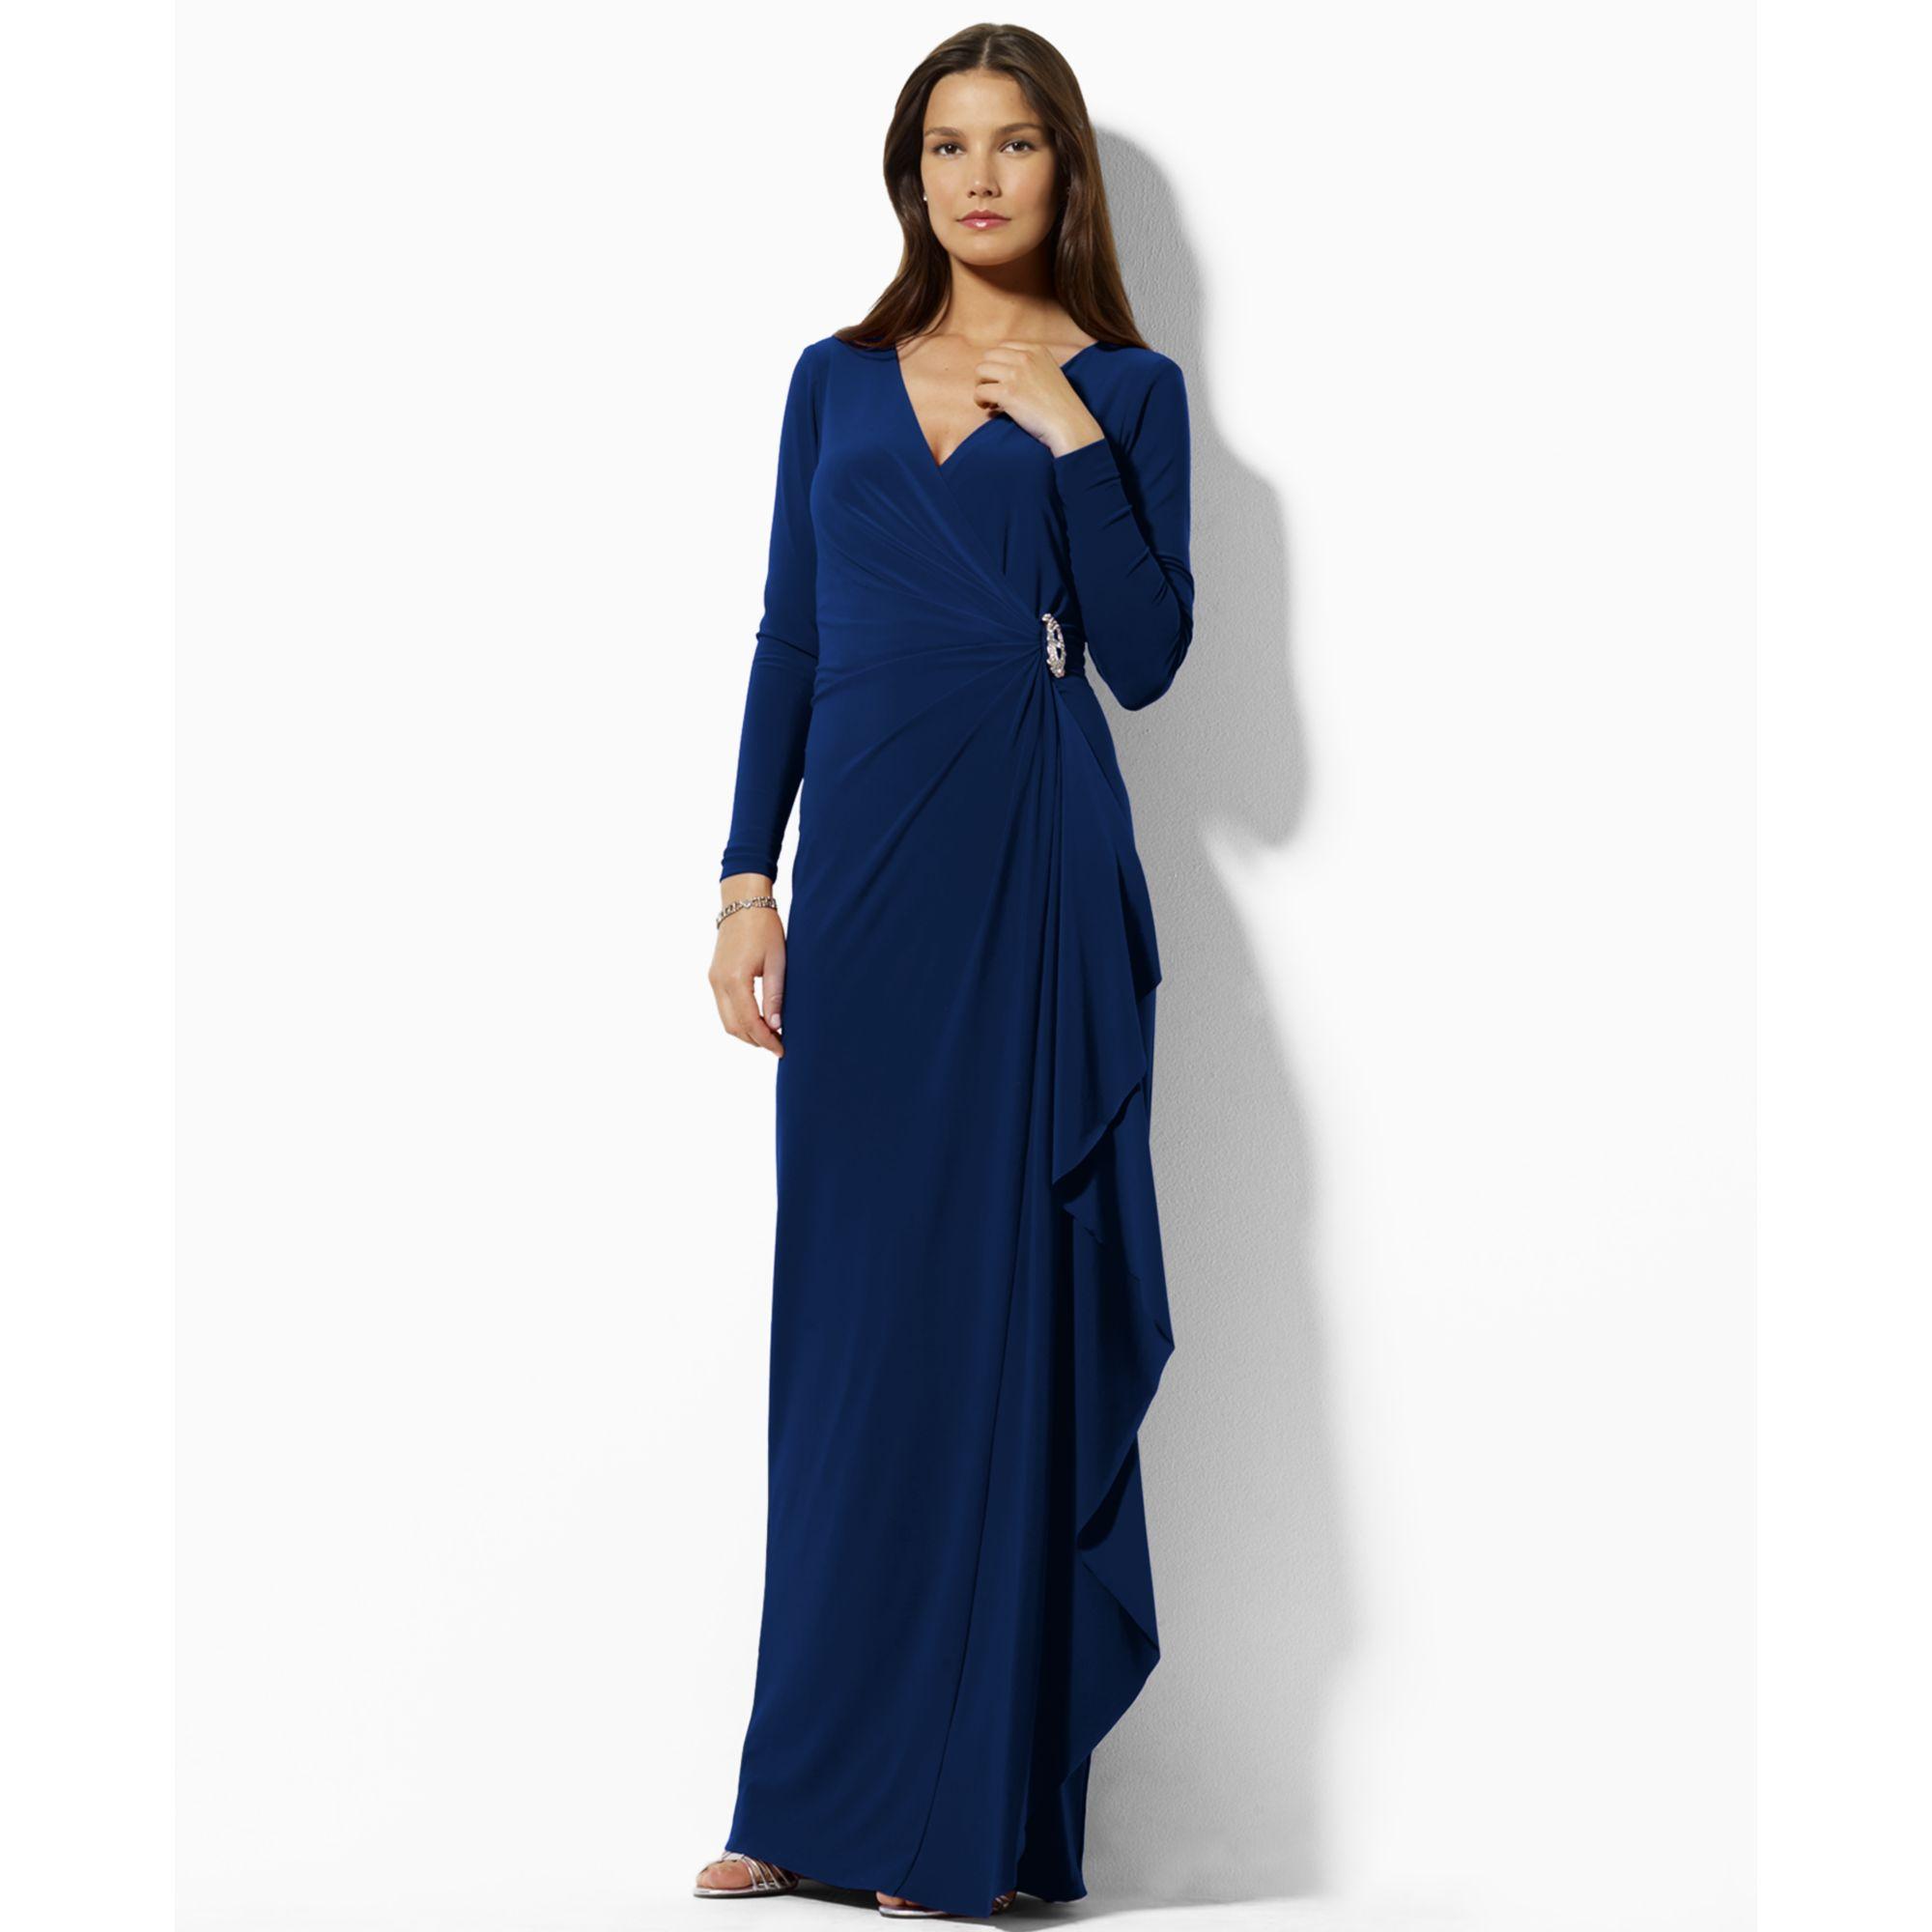 Lyst - Lauren By Ralph Lauren Lauren By Ralph Lauren Dress Long ...